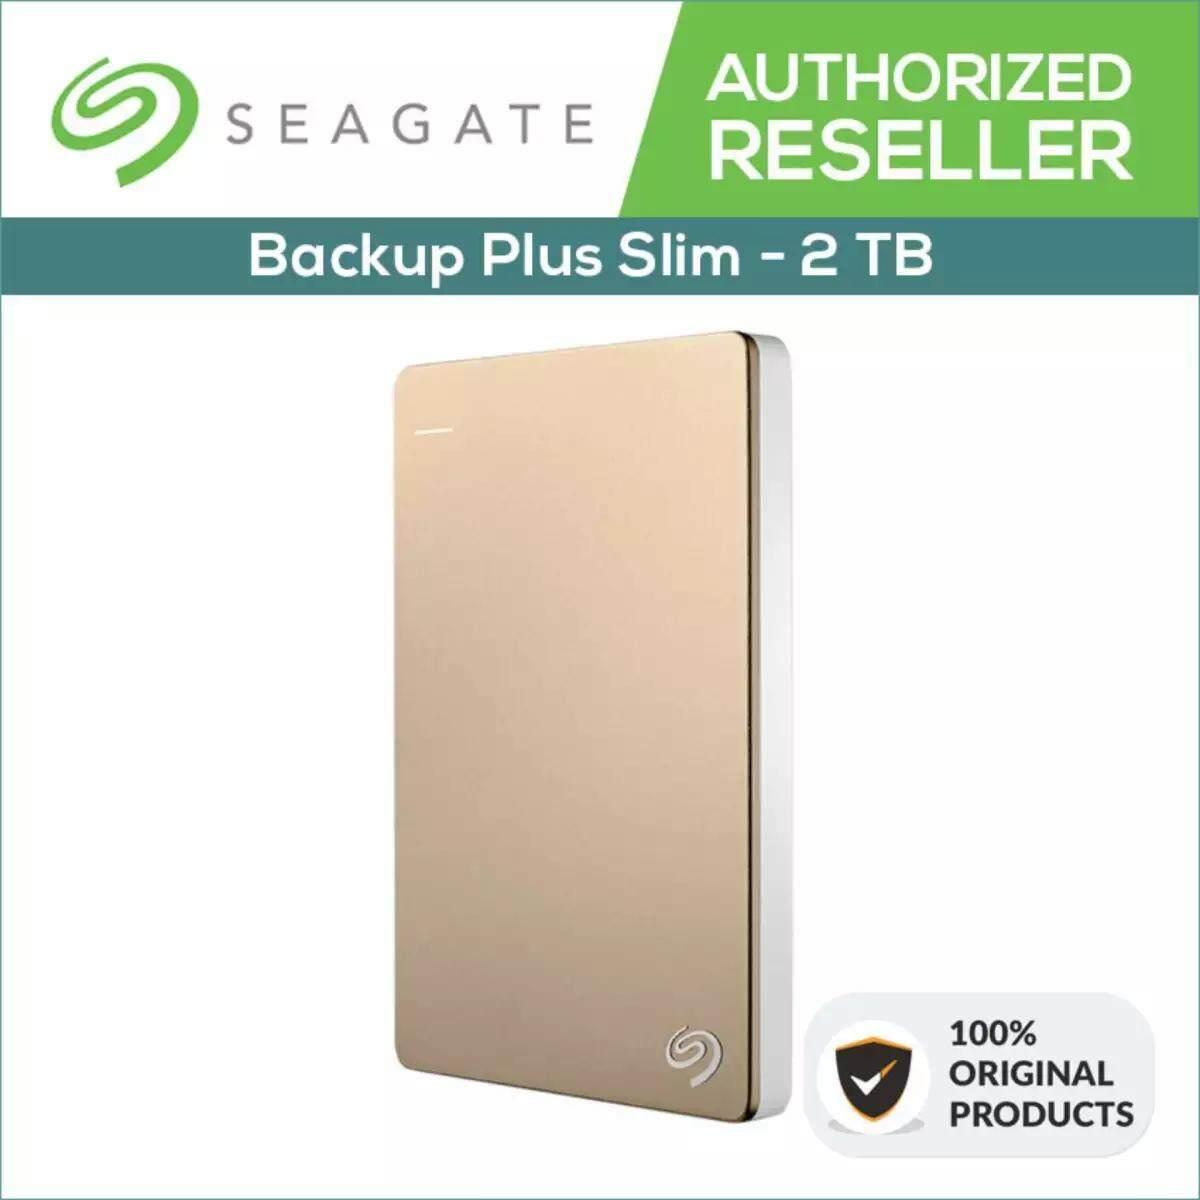 Seagate 2TB HDD Backup Plus Slim Portable External Hard Disk Drive USB 3.0 (Gold)